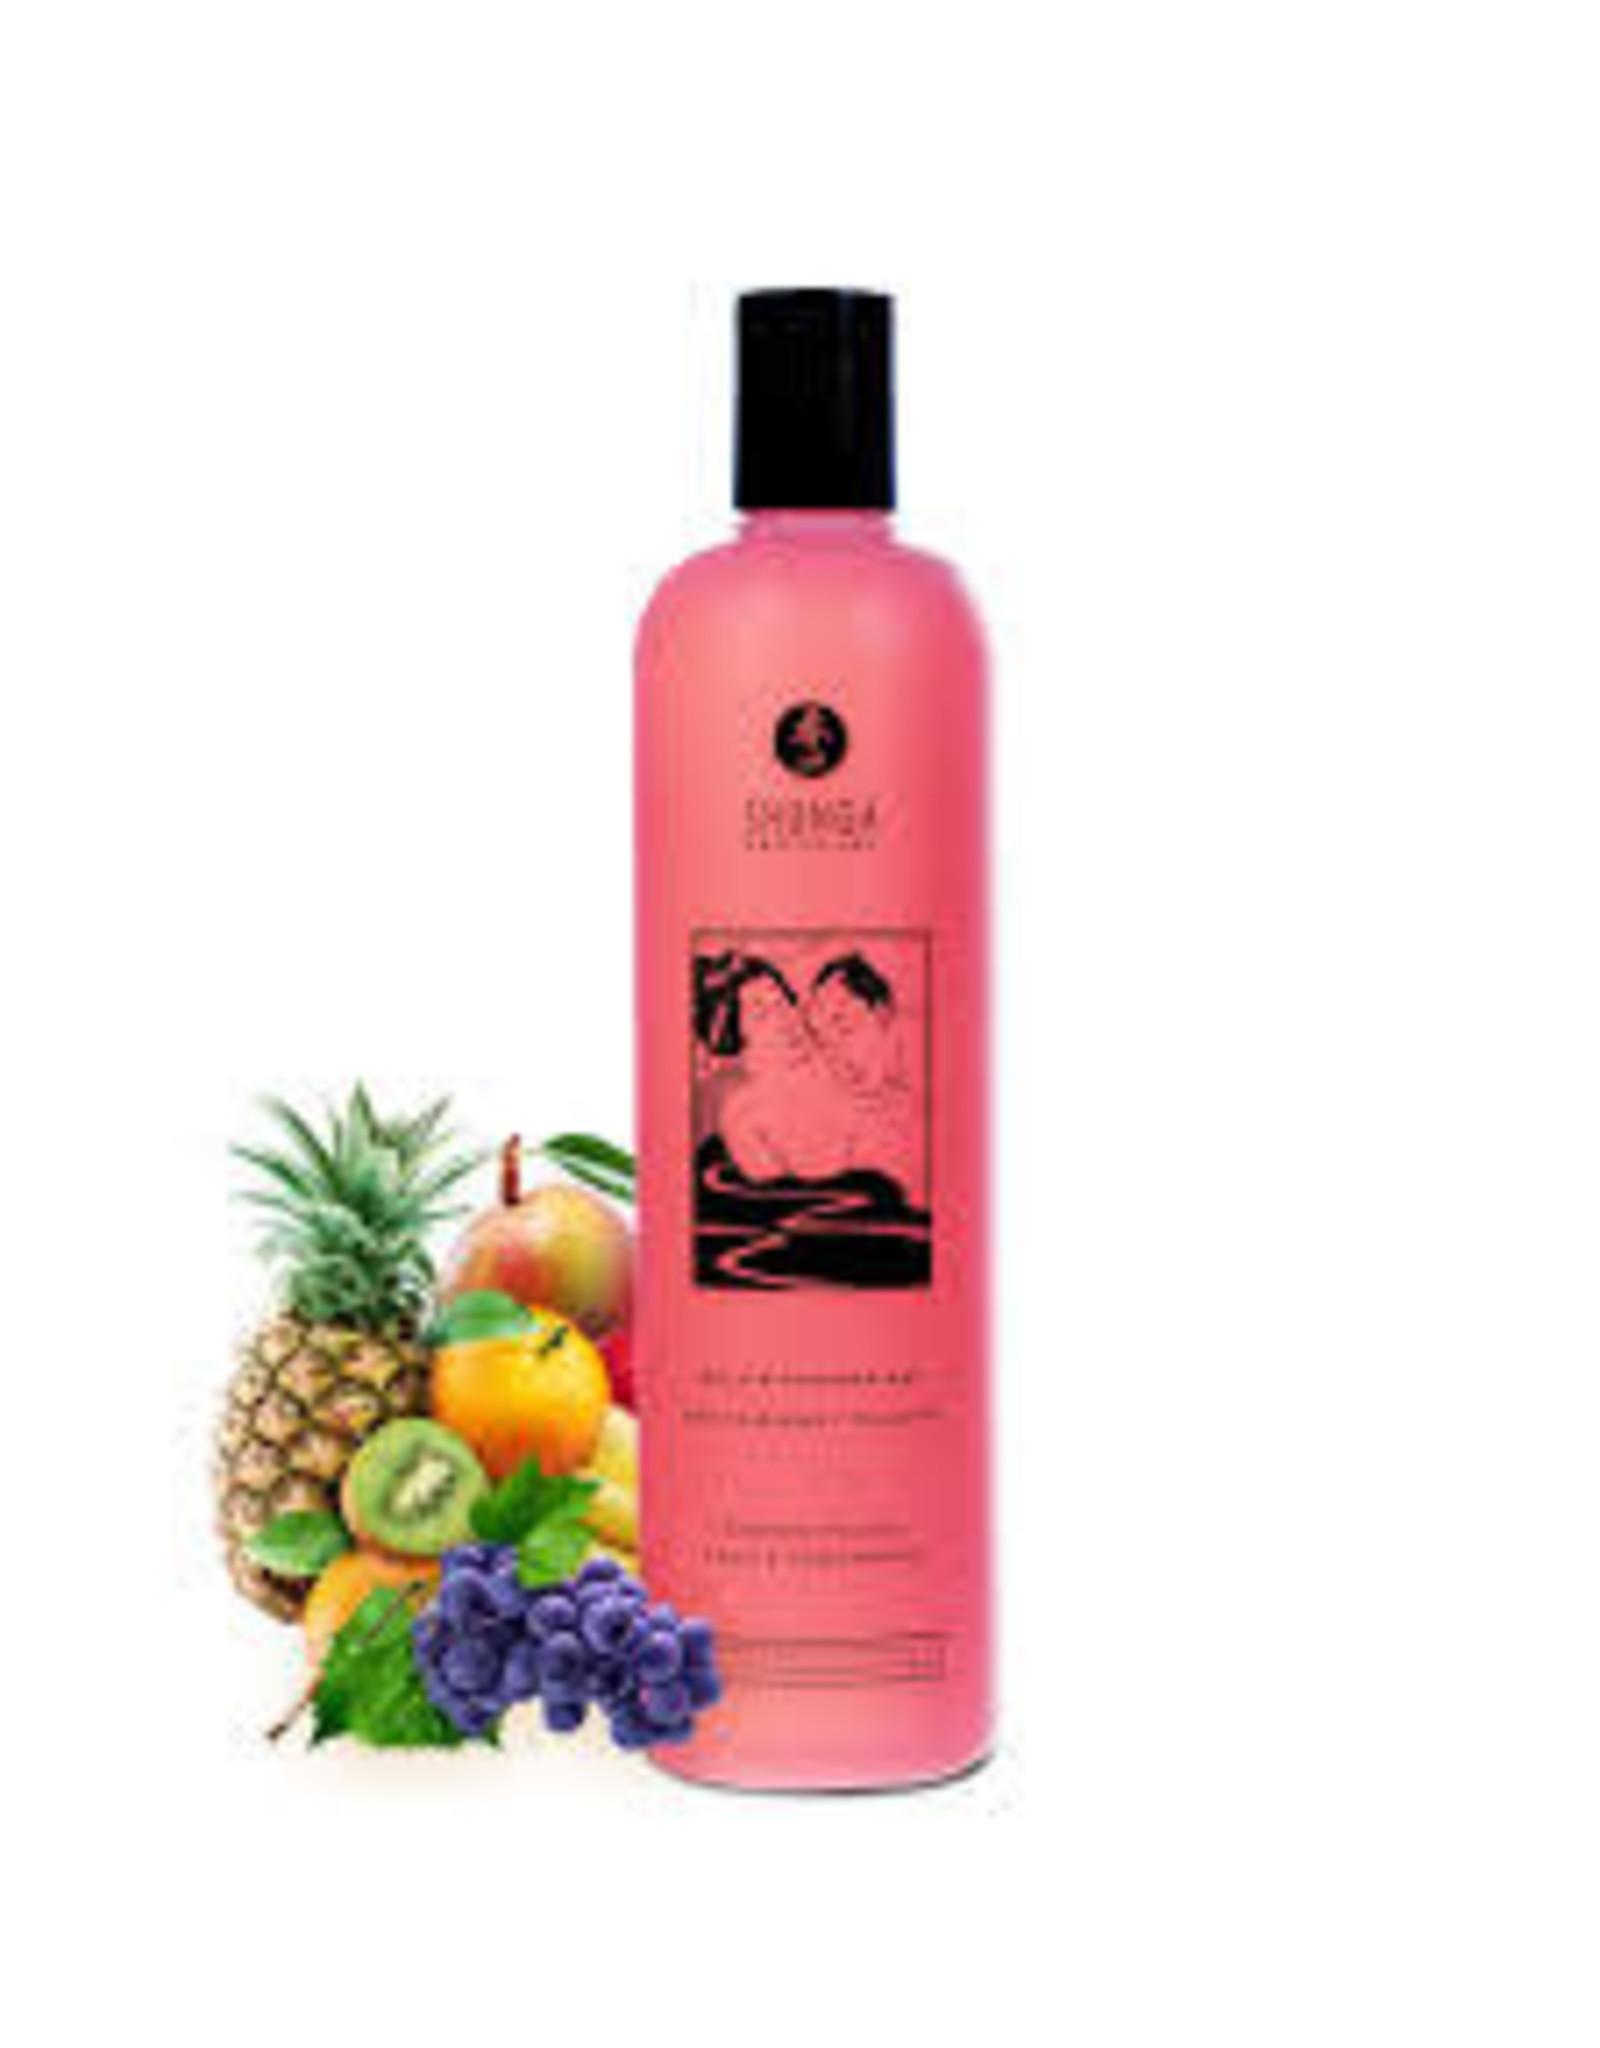 Shunga Shunga - Bath & Shower Gel - Exotic Fruits